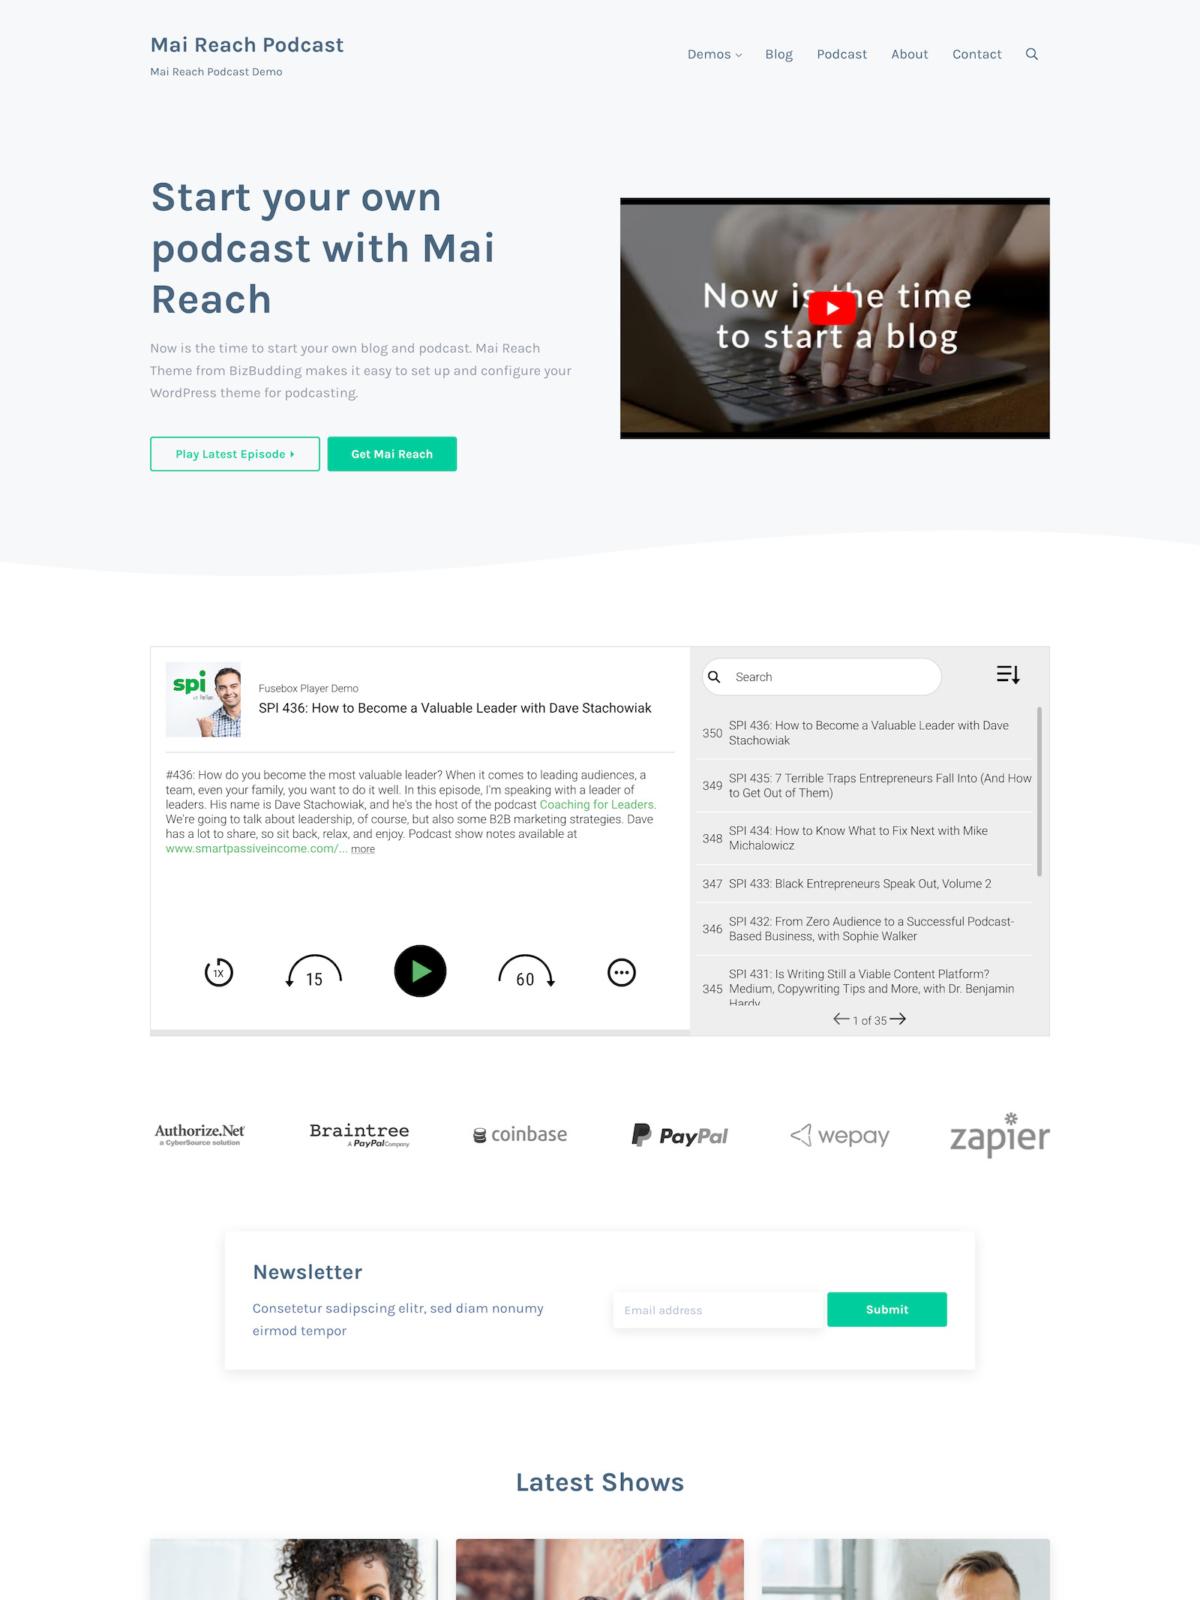 Mai Reach Podcast Theme Mockup